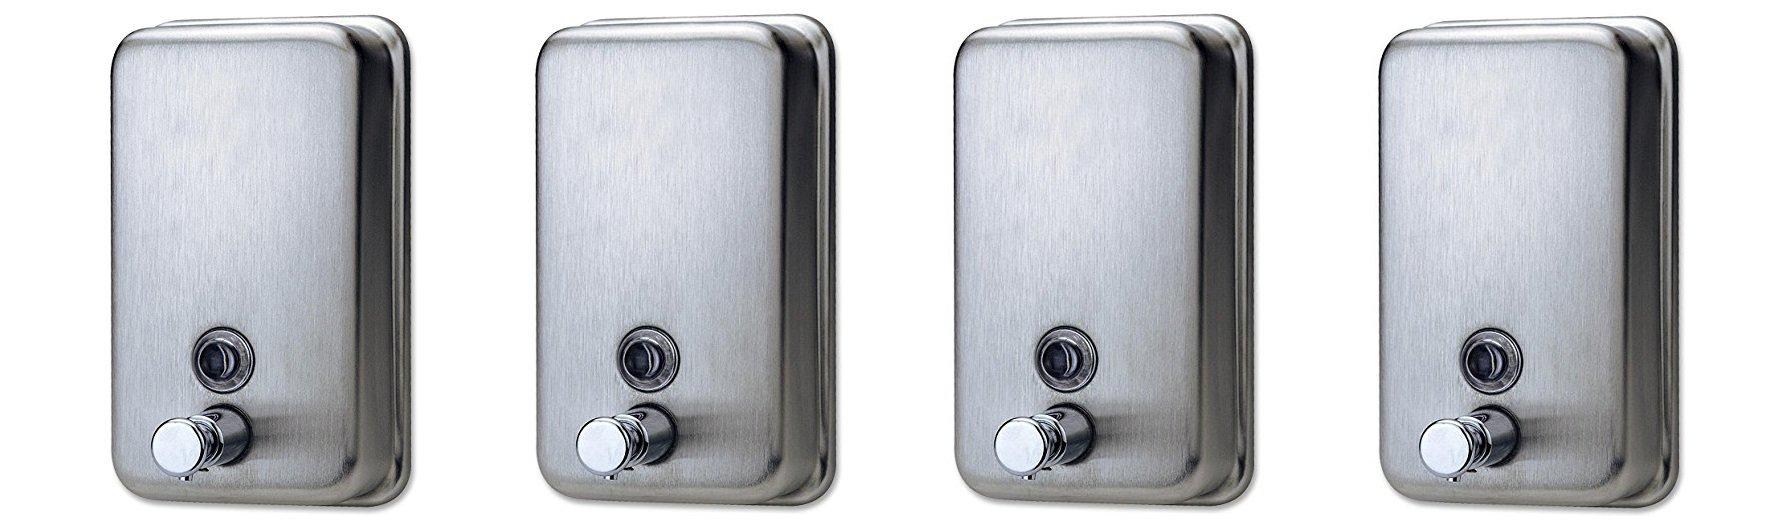 Genuine Joe GJO02201 Stainless Steel Manual Soap Dispenser, 31.5 fl oz Capacity (Pack of 4)